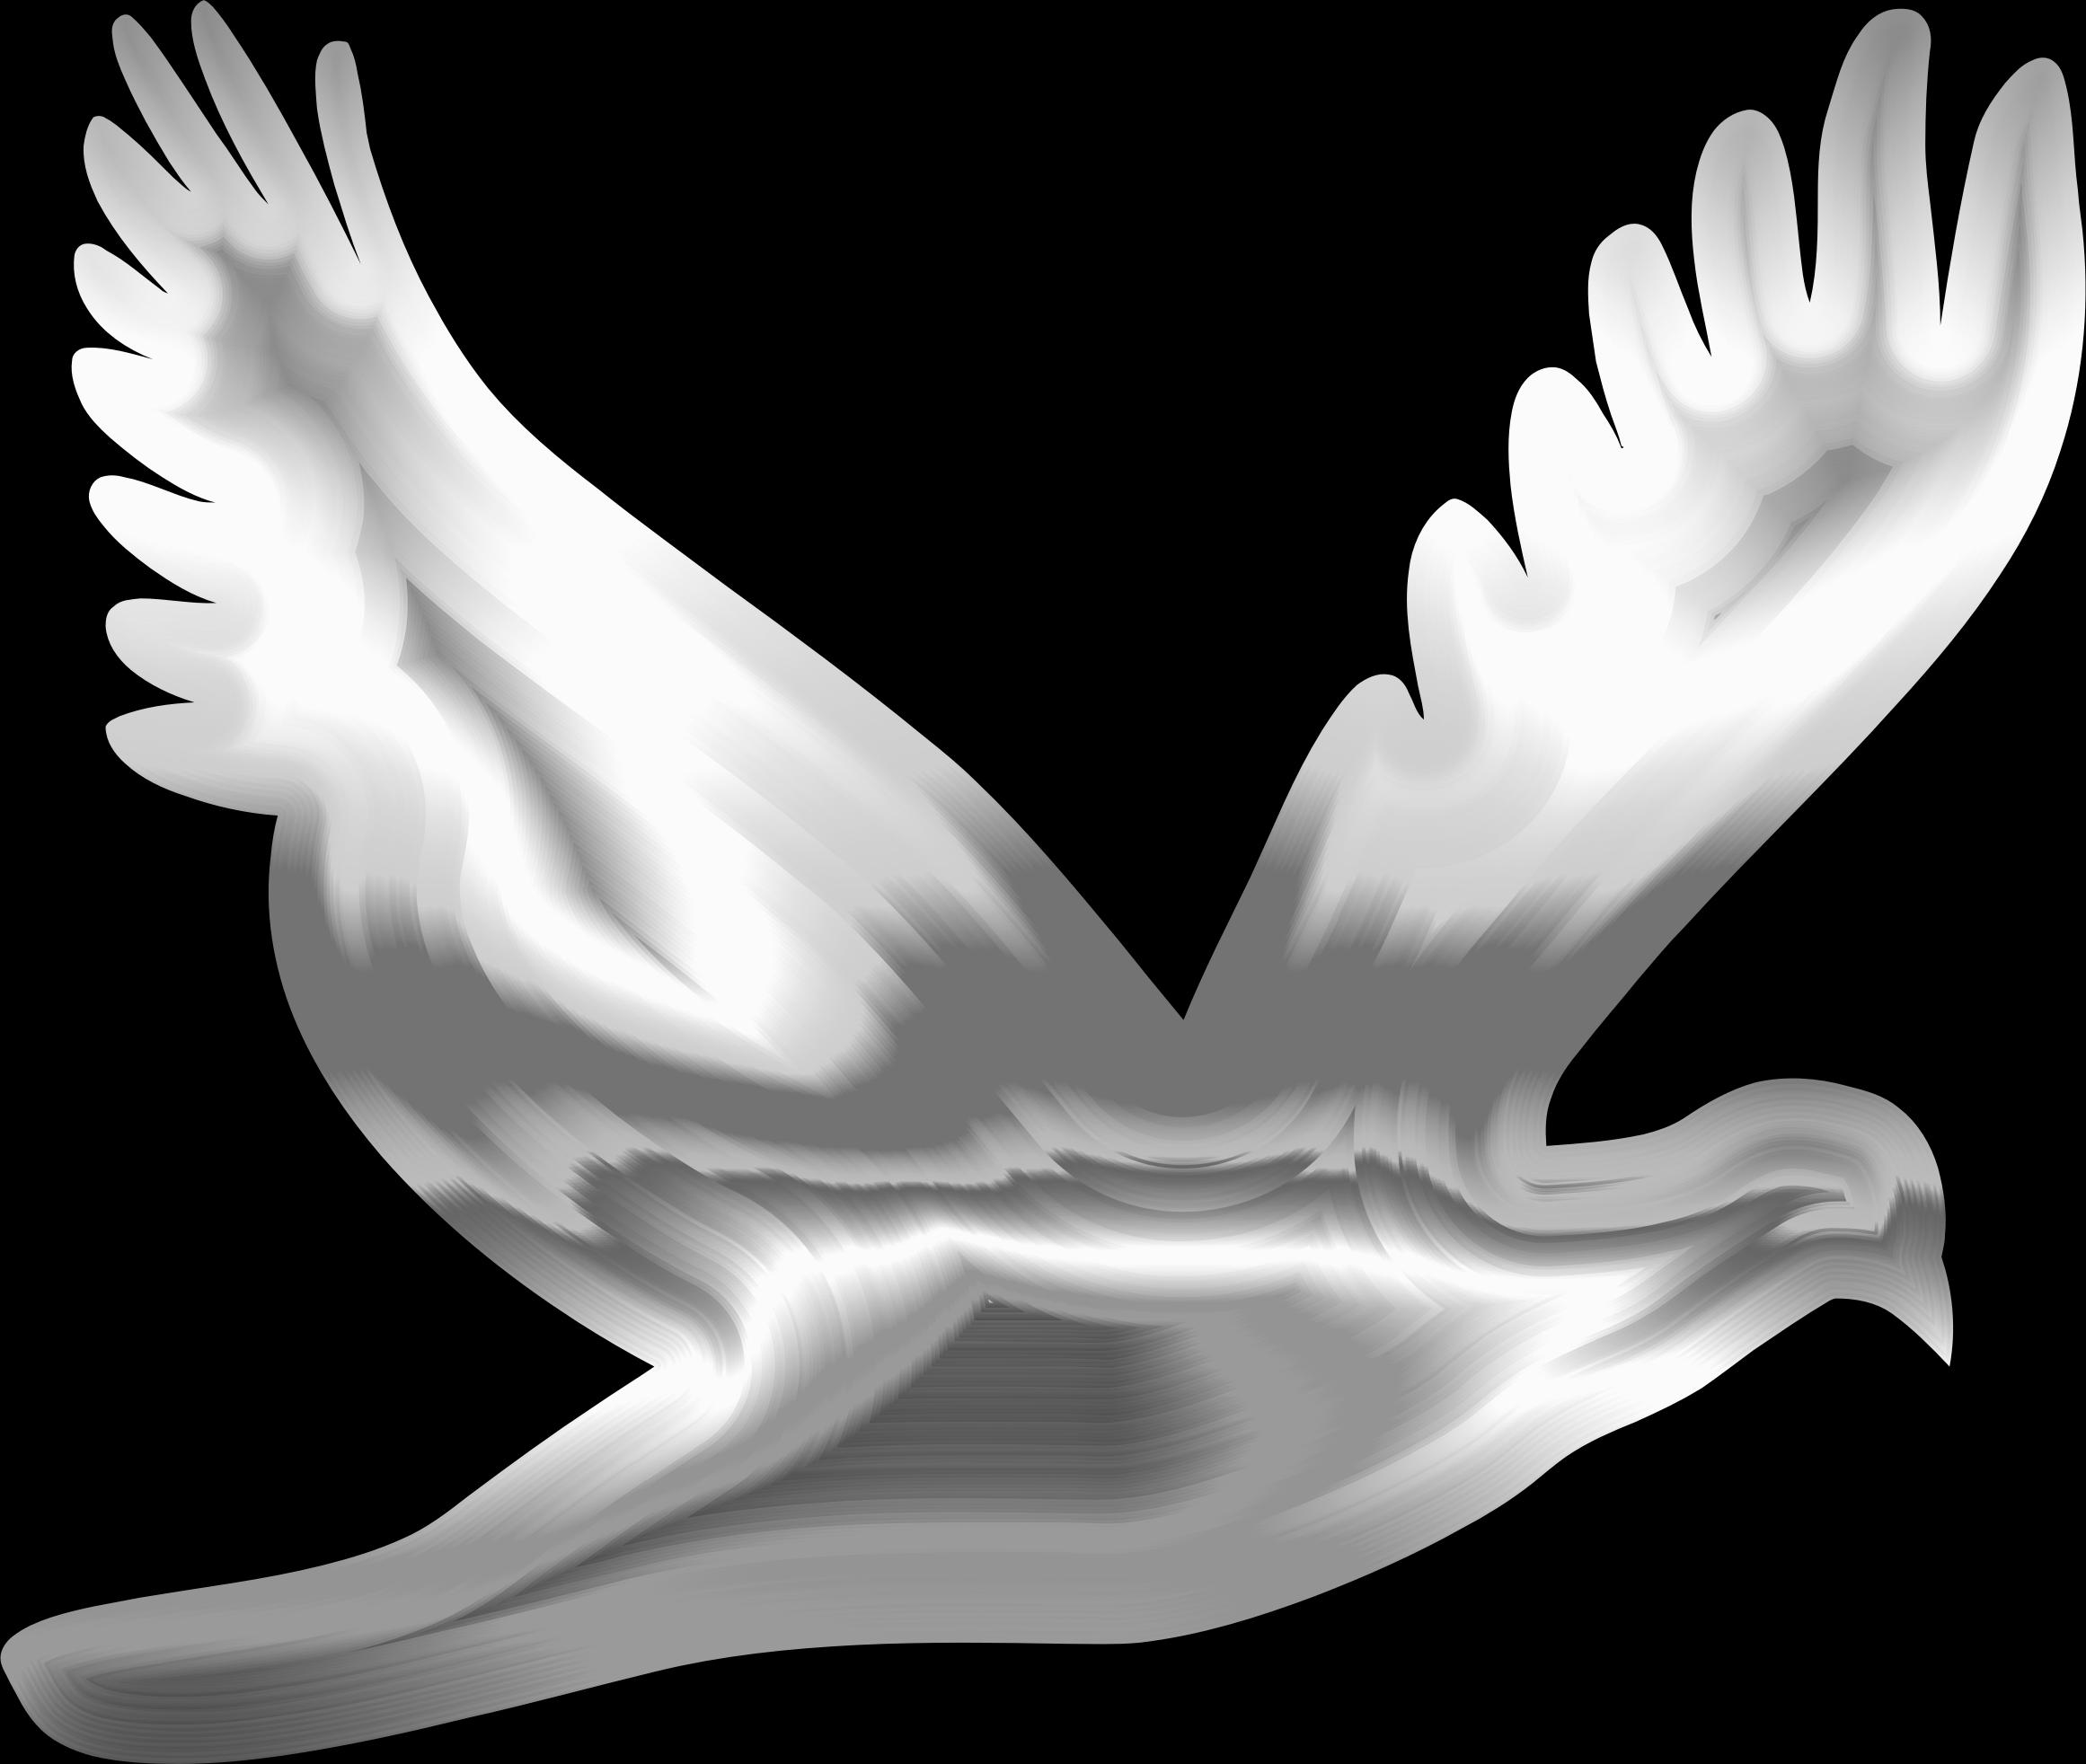 Democracy clipart gavel. Flying dove animal free